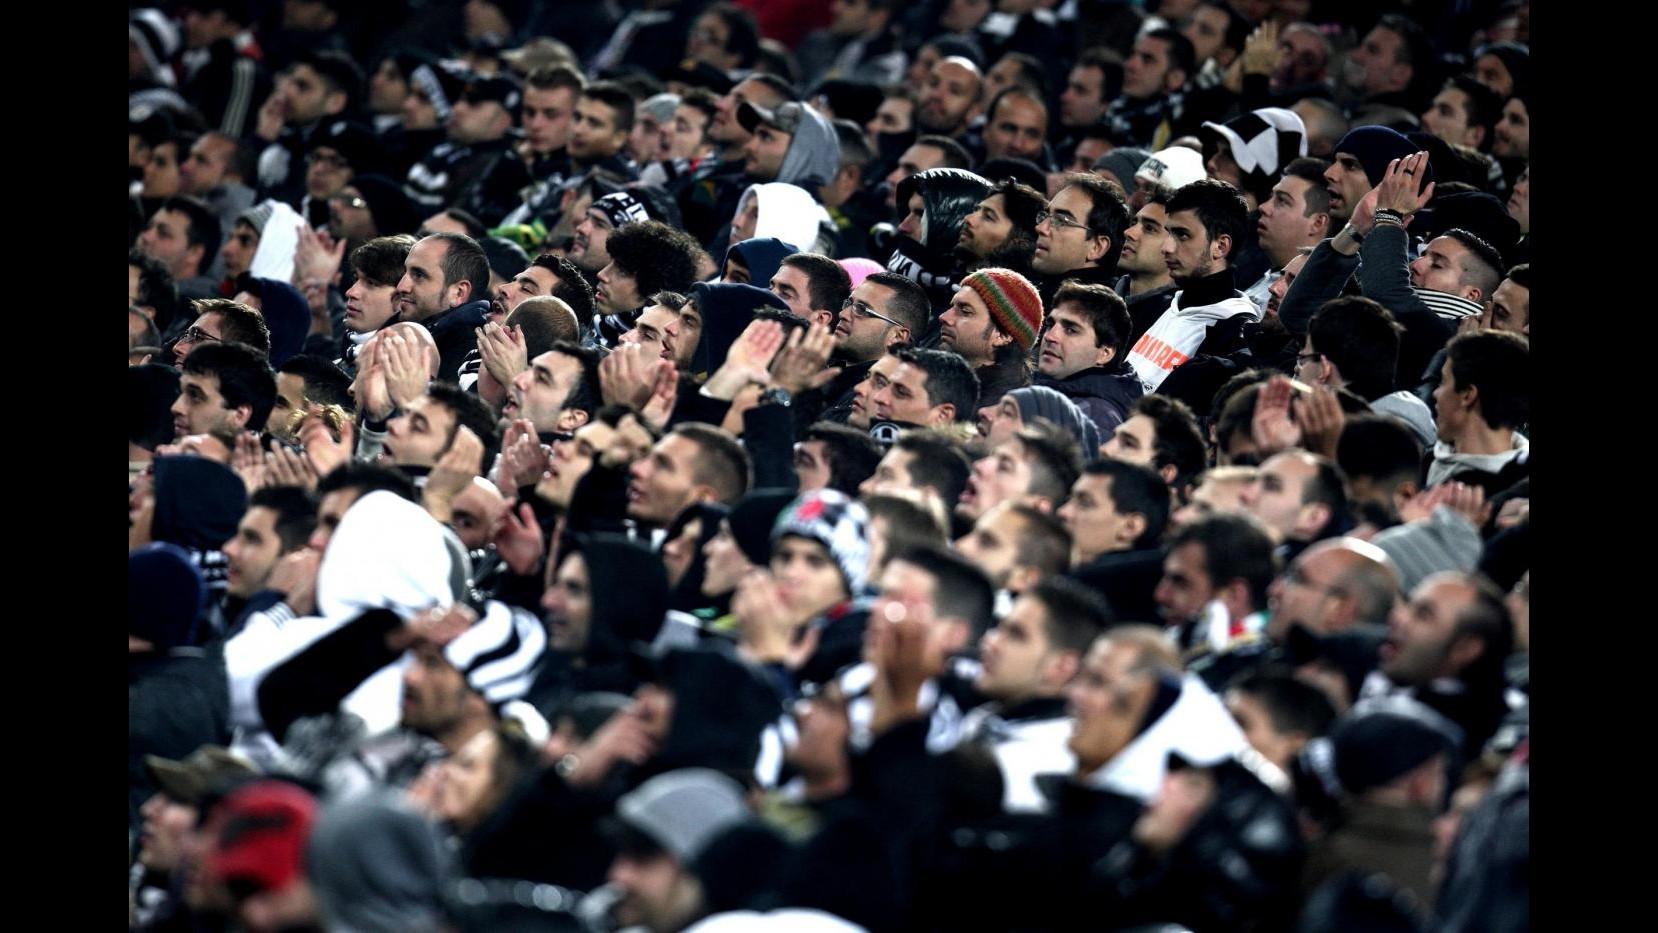 Striscioni su tragedia Superga: 3 tifosi Juve denunciati, Daspo per due anni